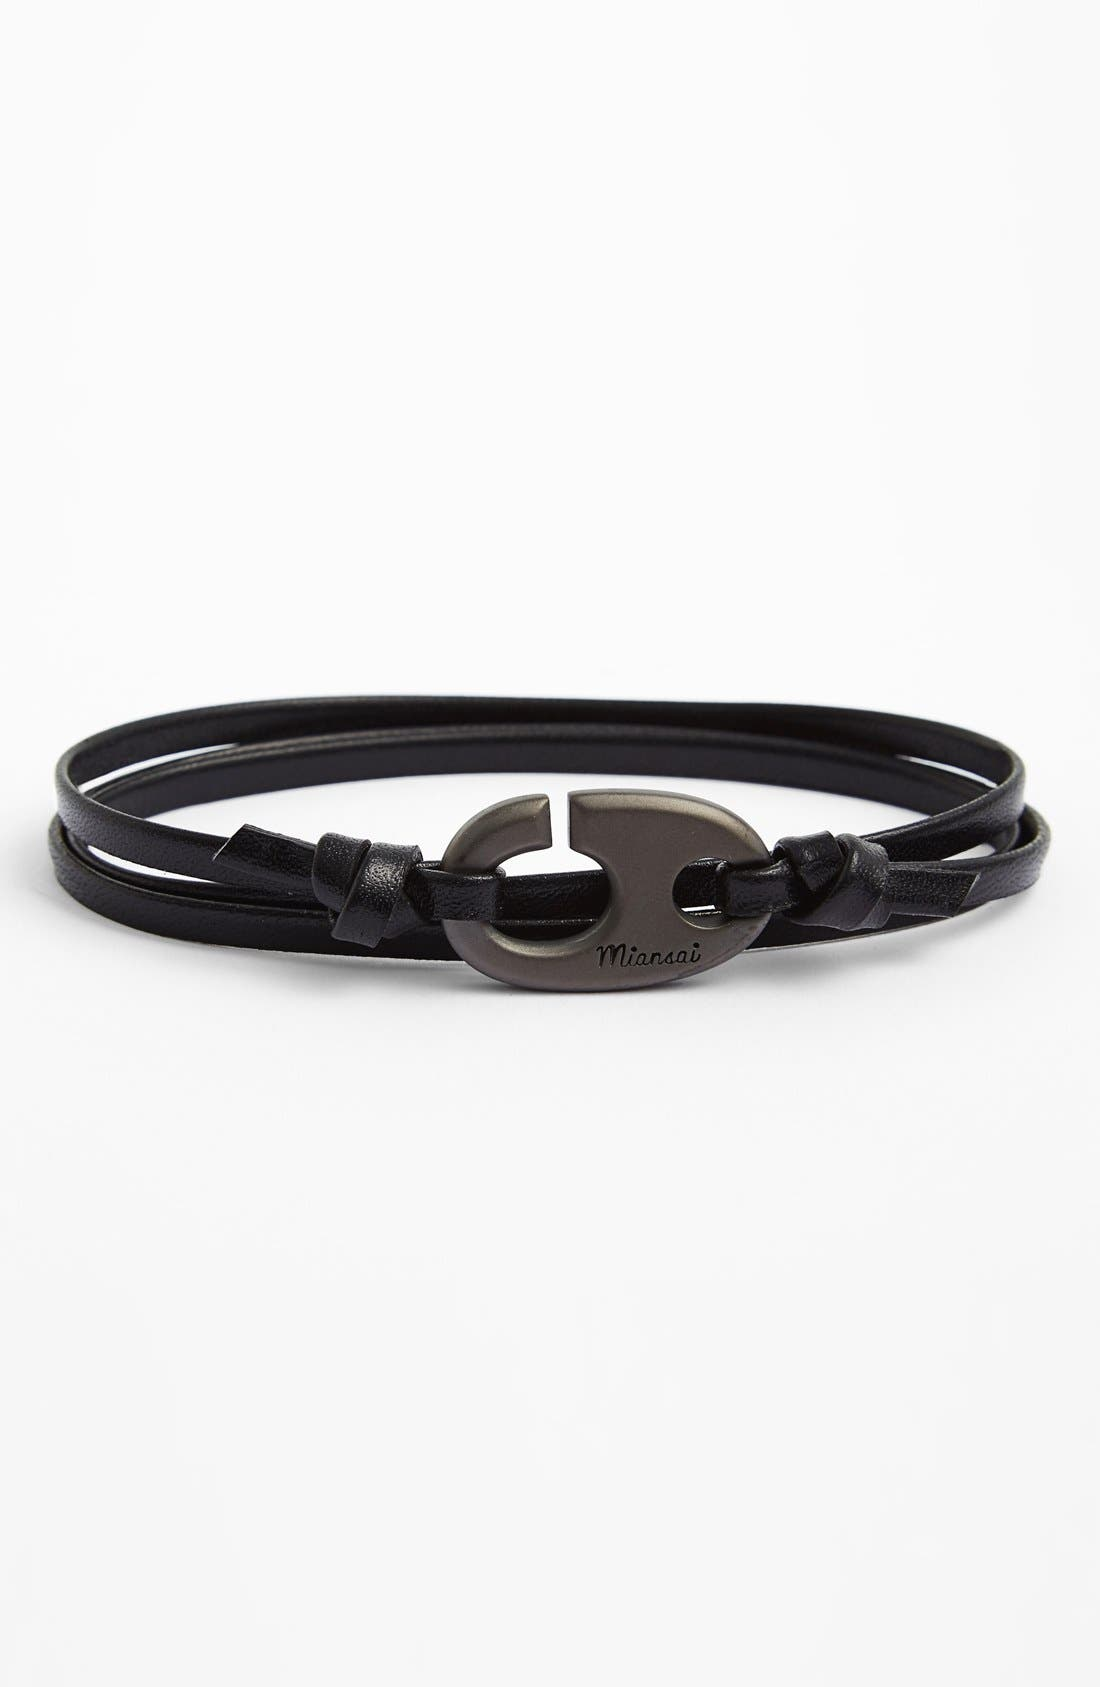 Alternate Image 1 Selected - Miansai Gold Plated Brummel Hook Leather Bracelet